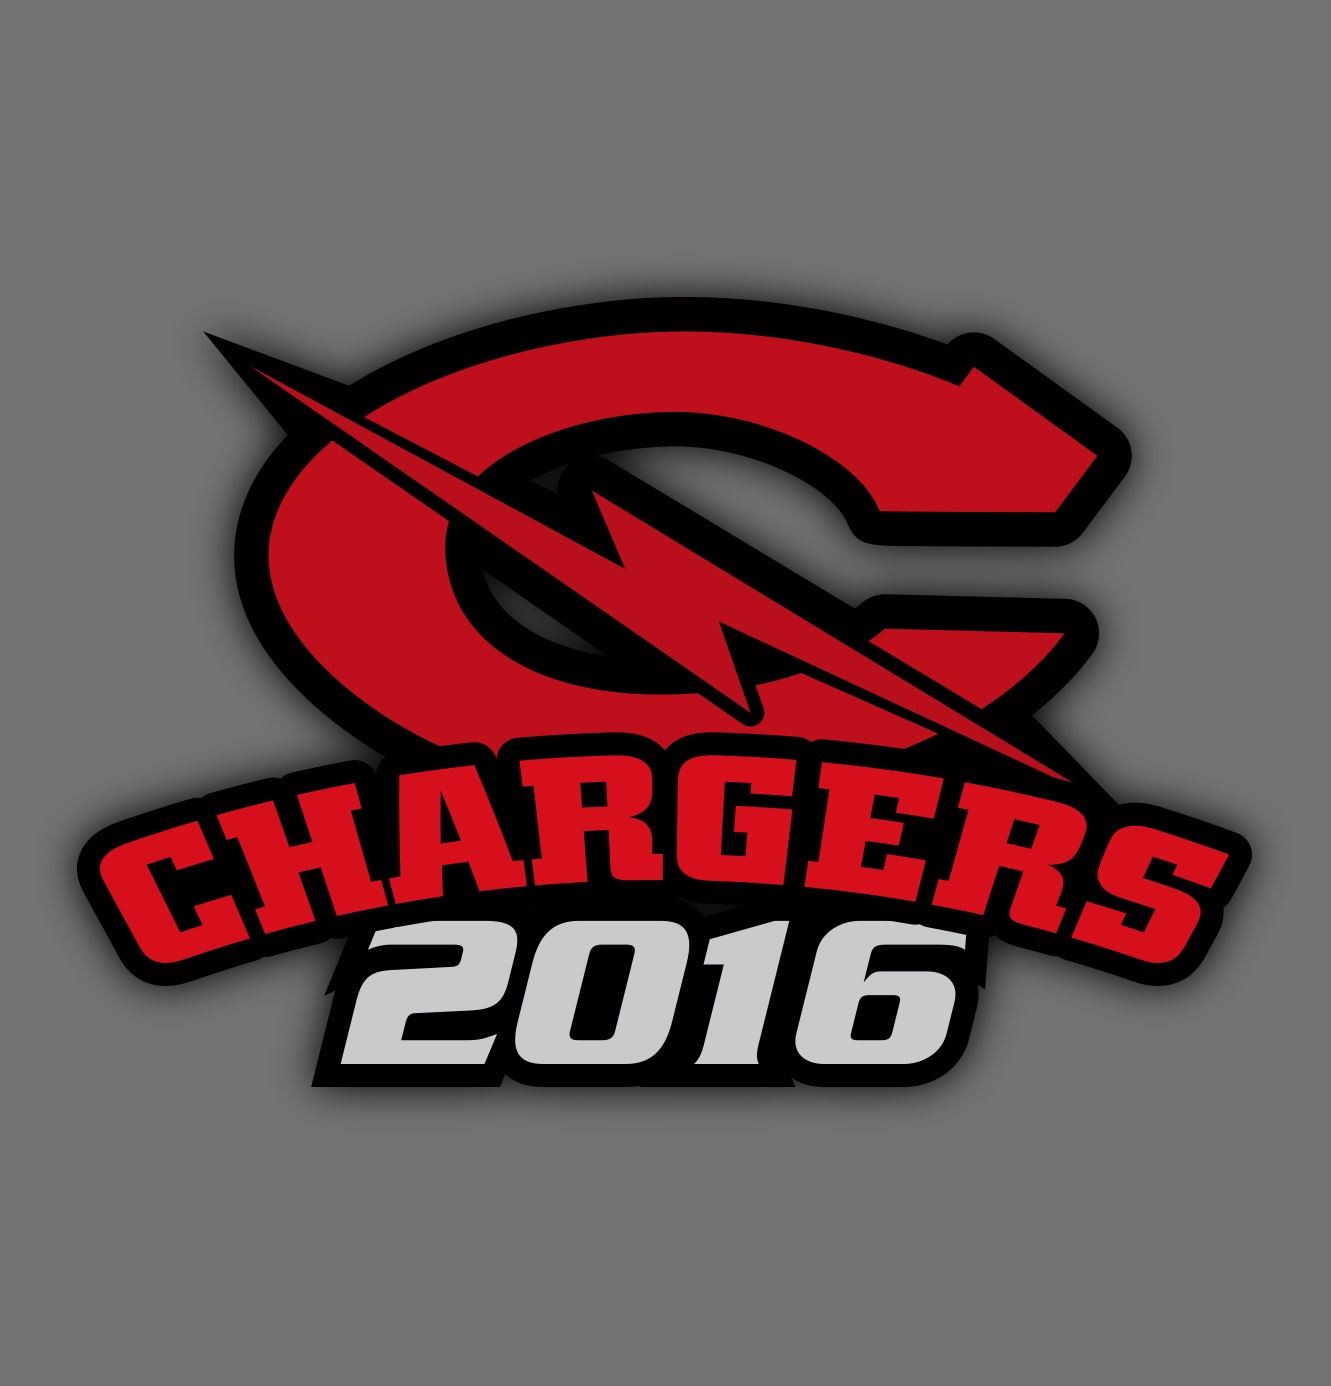 CUSHMO DESIGNS - Chargers 5th6th